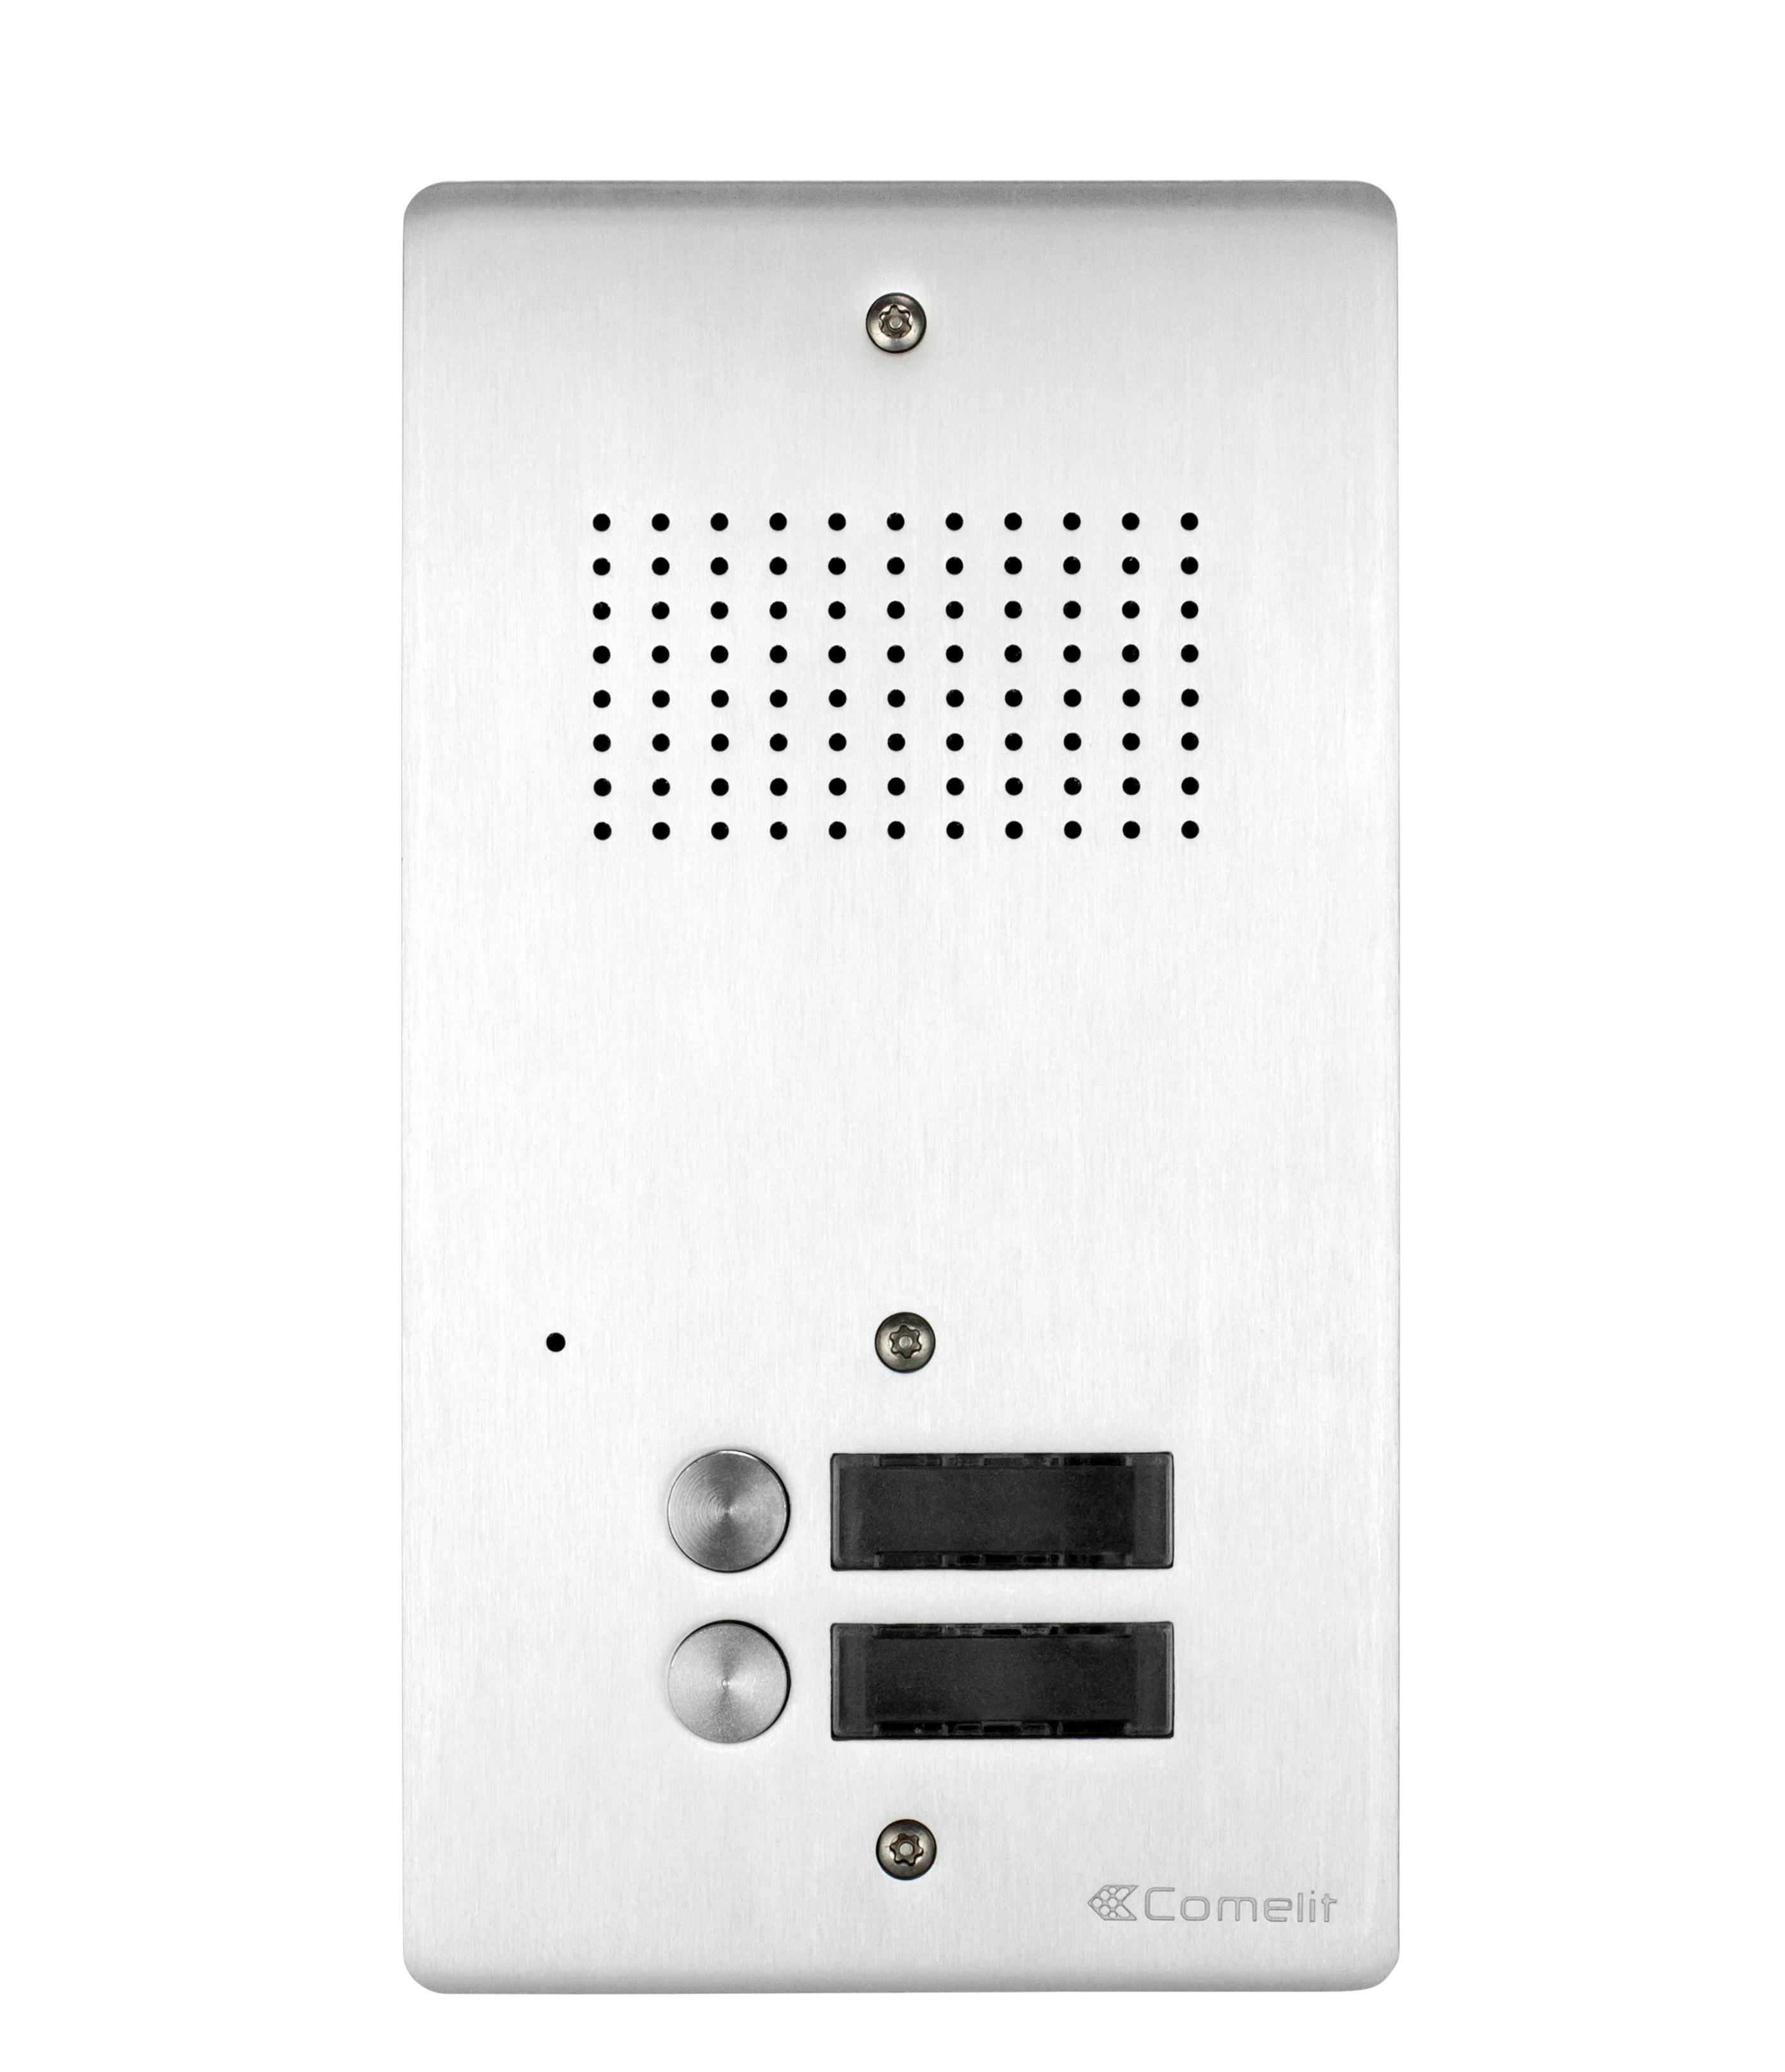 1 Stk AV-Panel Audio, 2 Tasten, ohne Postschloss-Ausschnitt, Alu SP3002NAA-